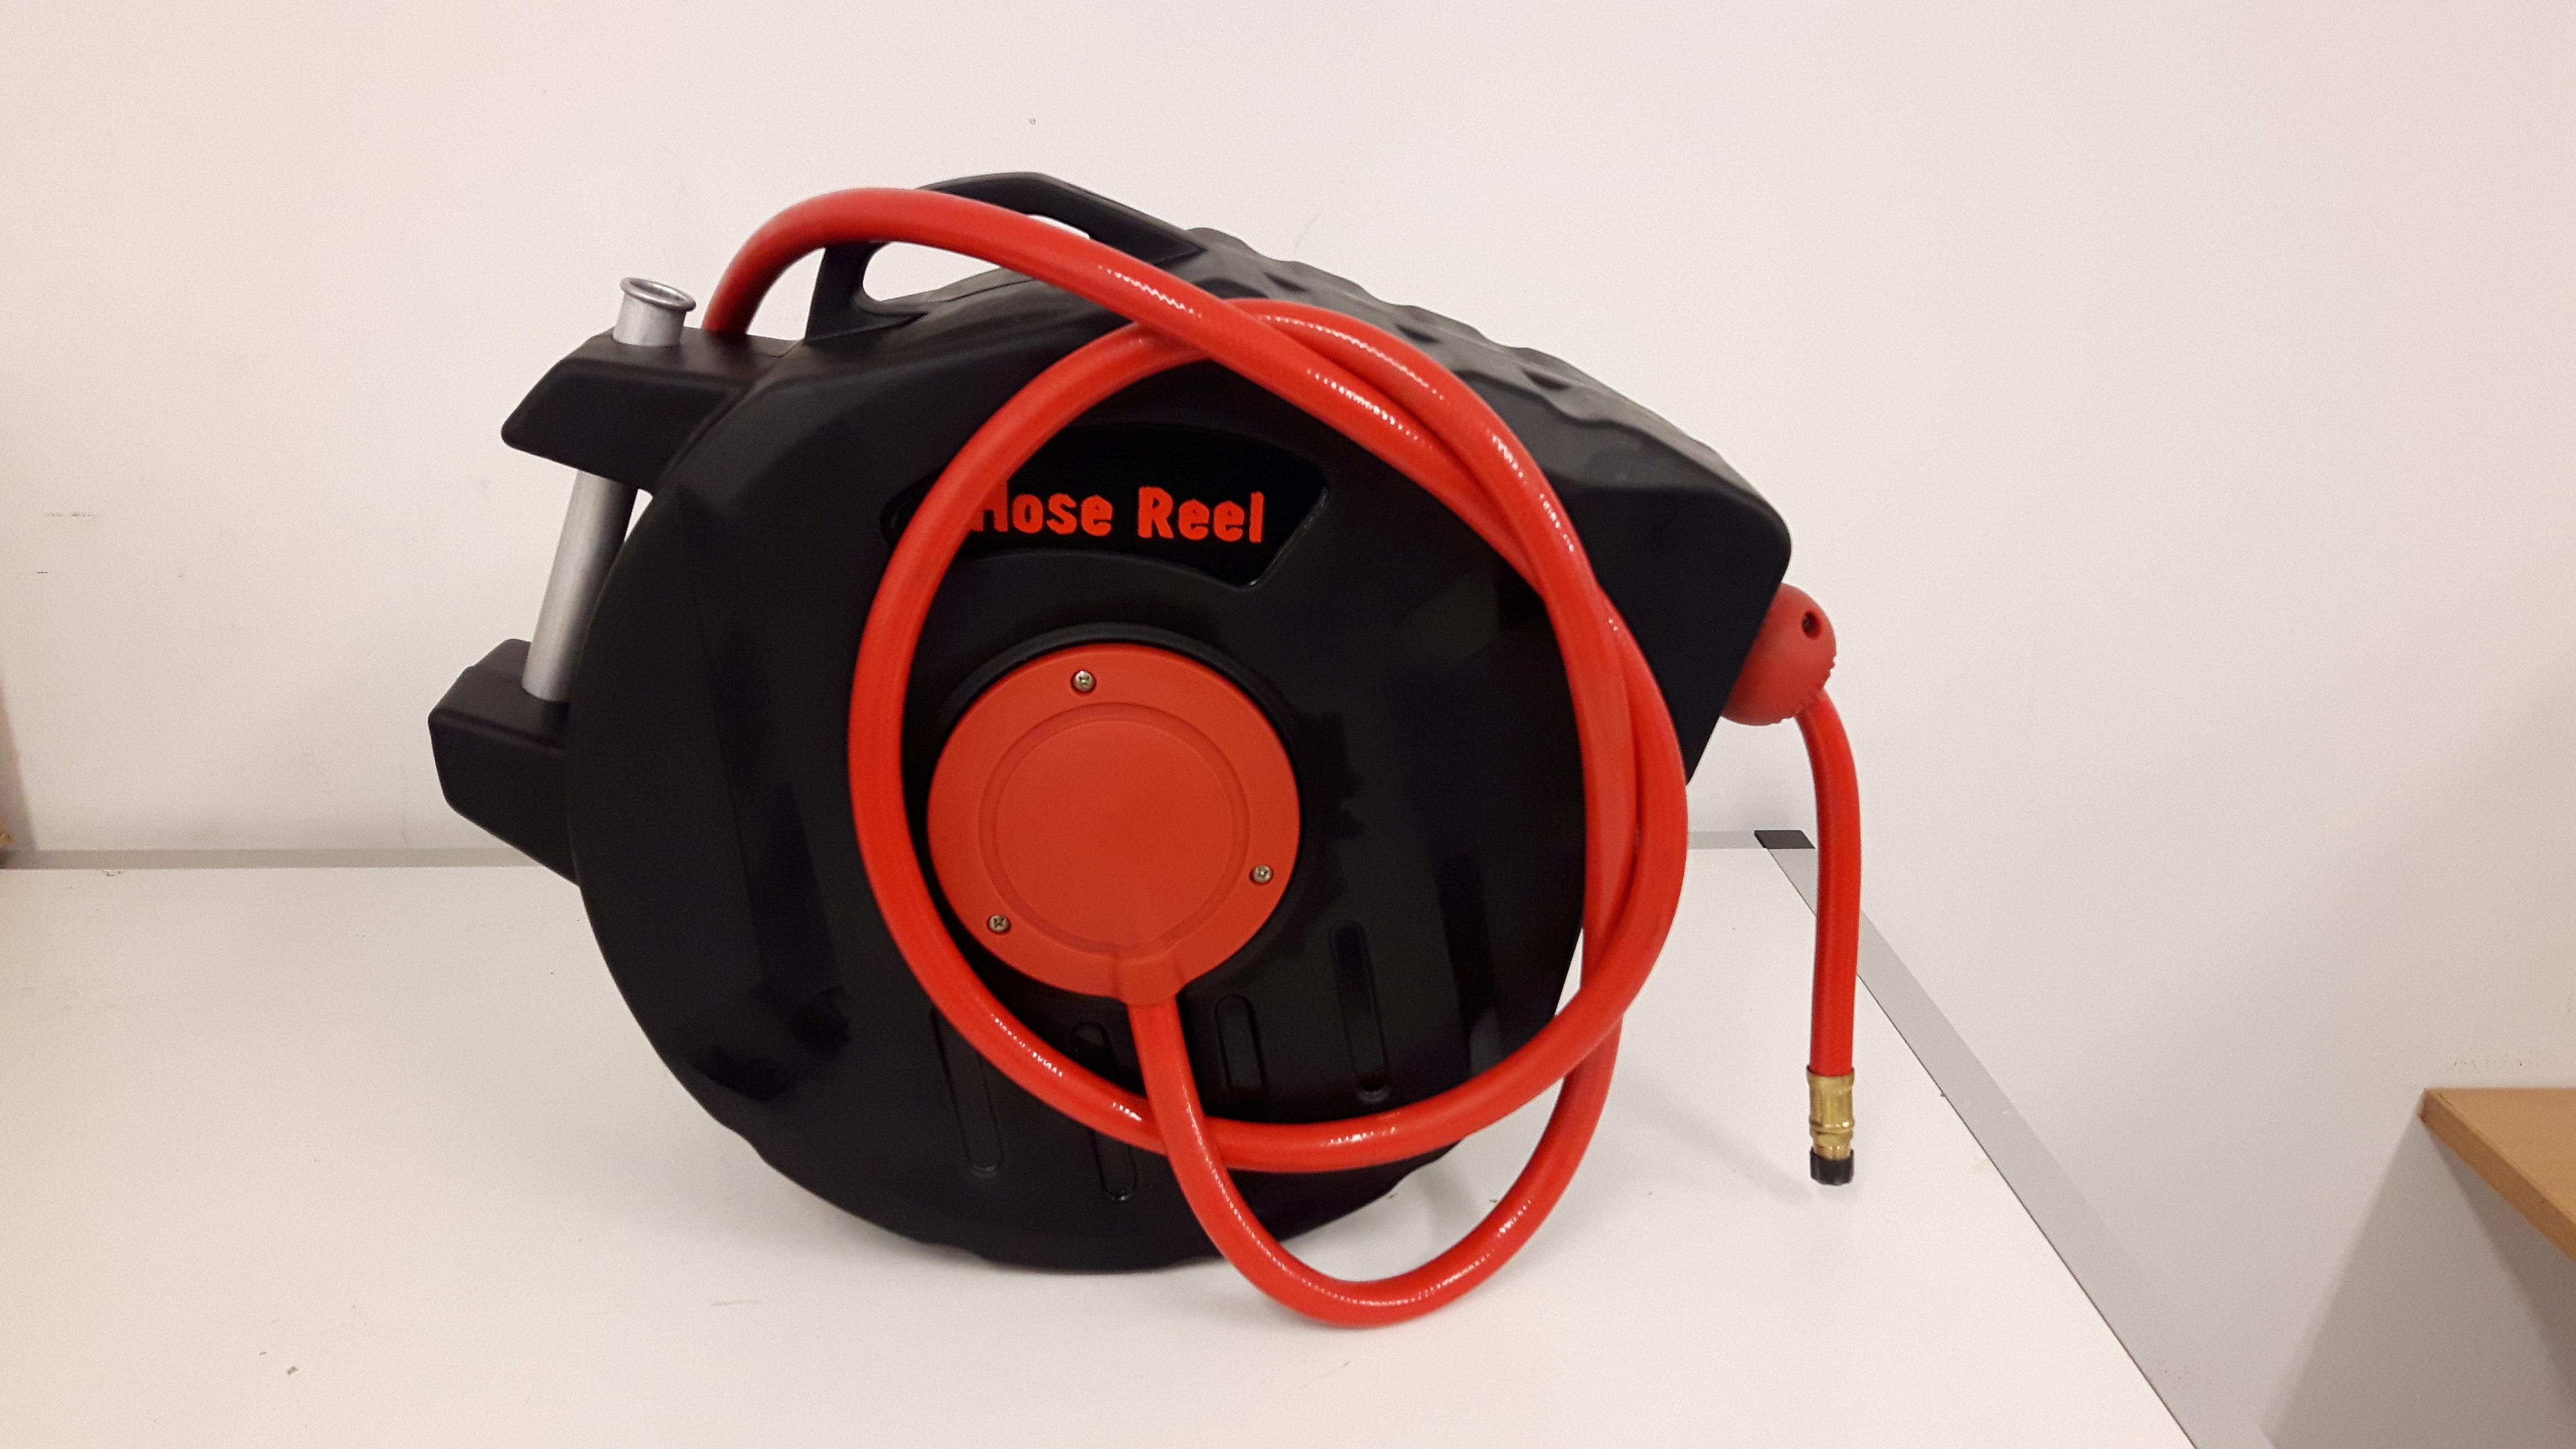 Unika Slangvinda för tryckluft 20+1m (ny) - Fri frakt - PS Auction – Vi FI-61